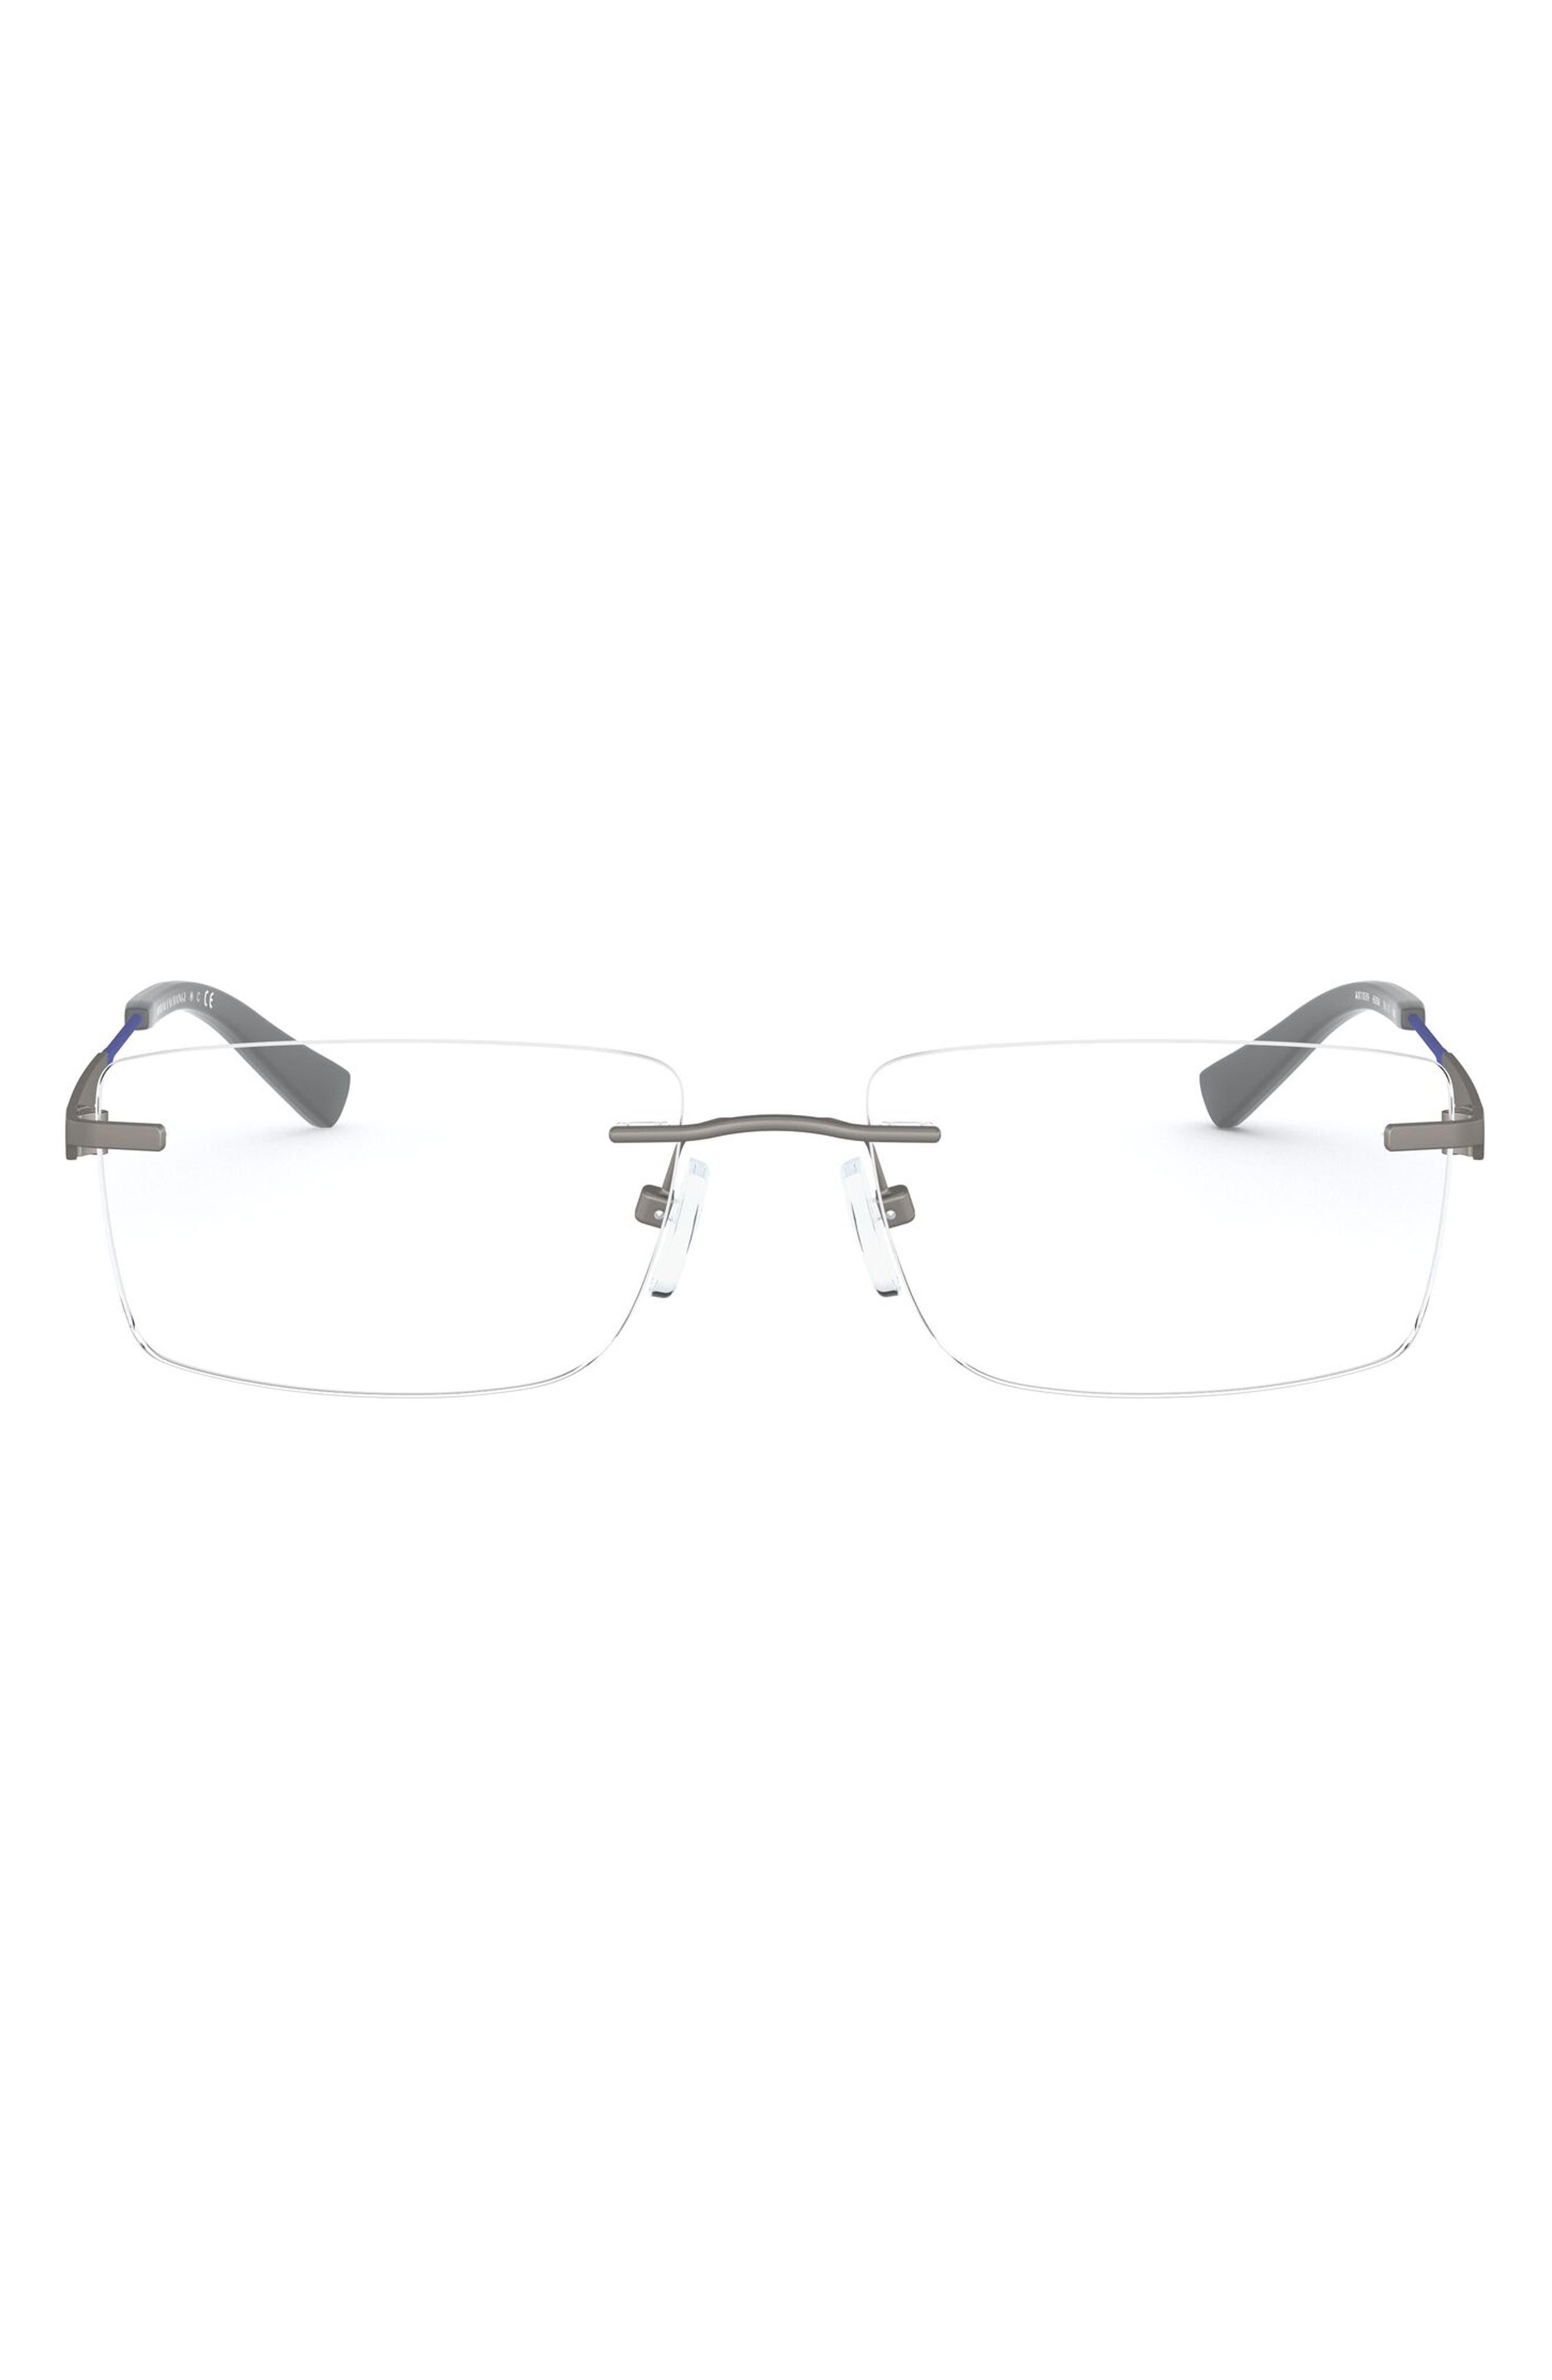 56mm Rimles Optical Glasses